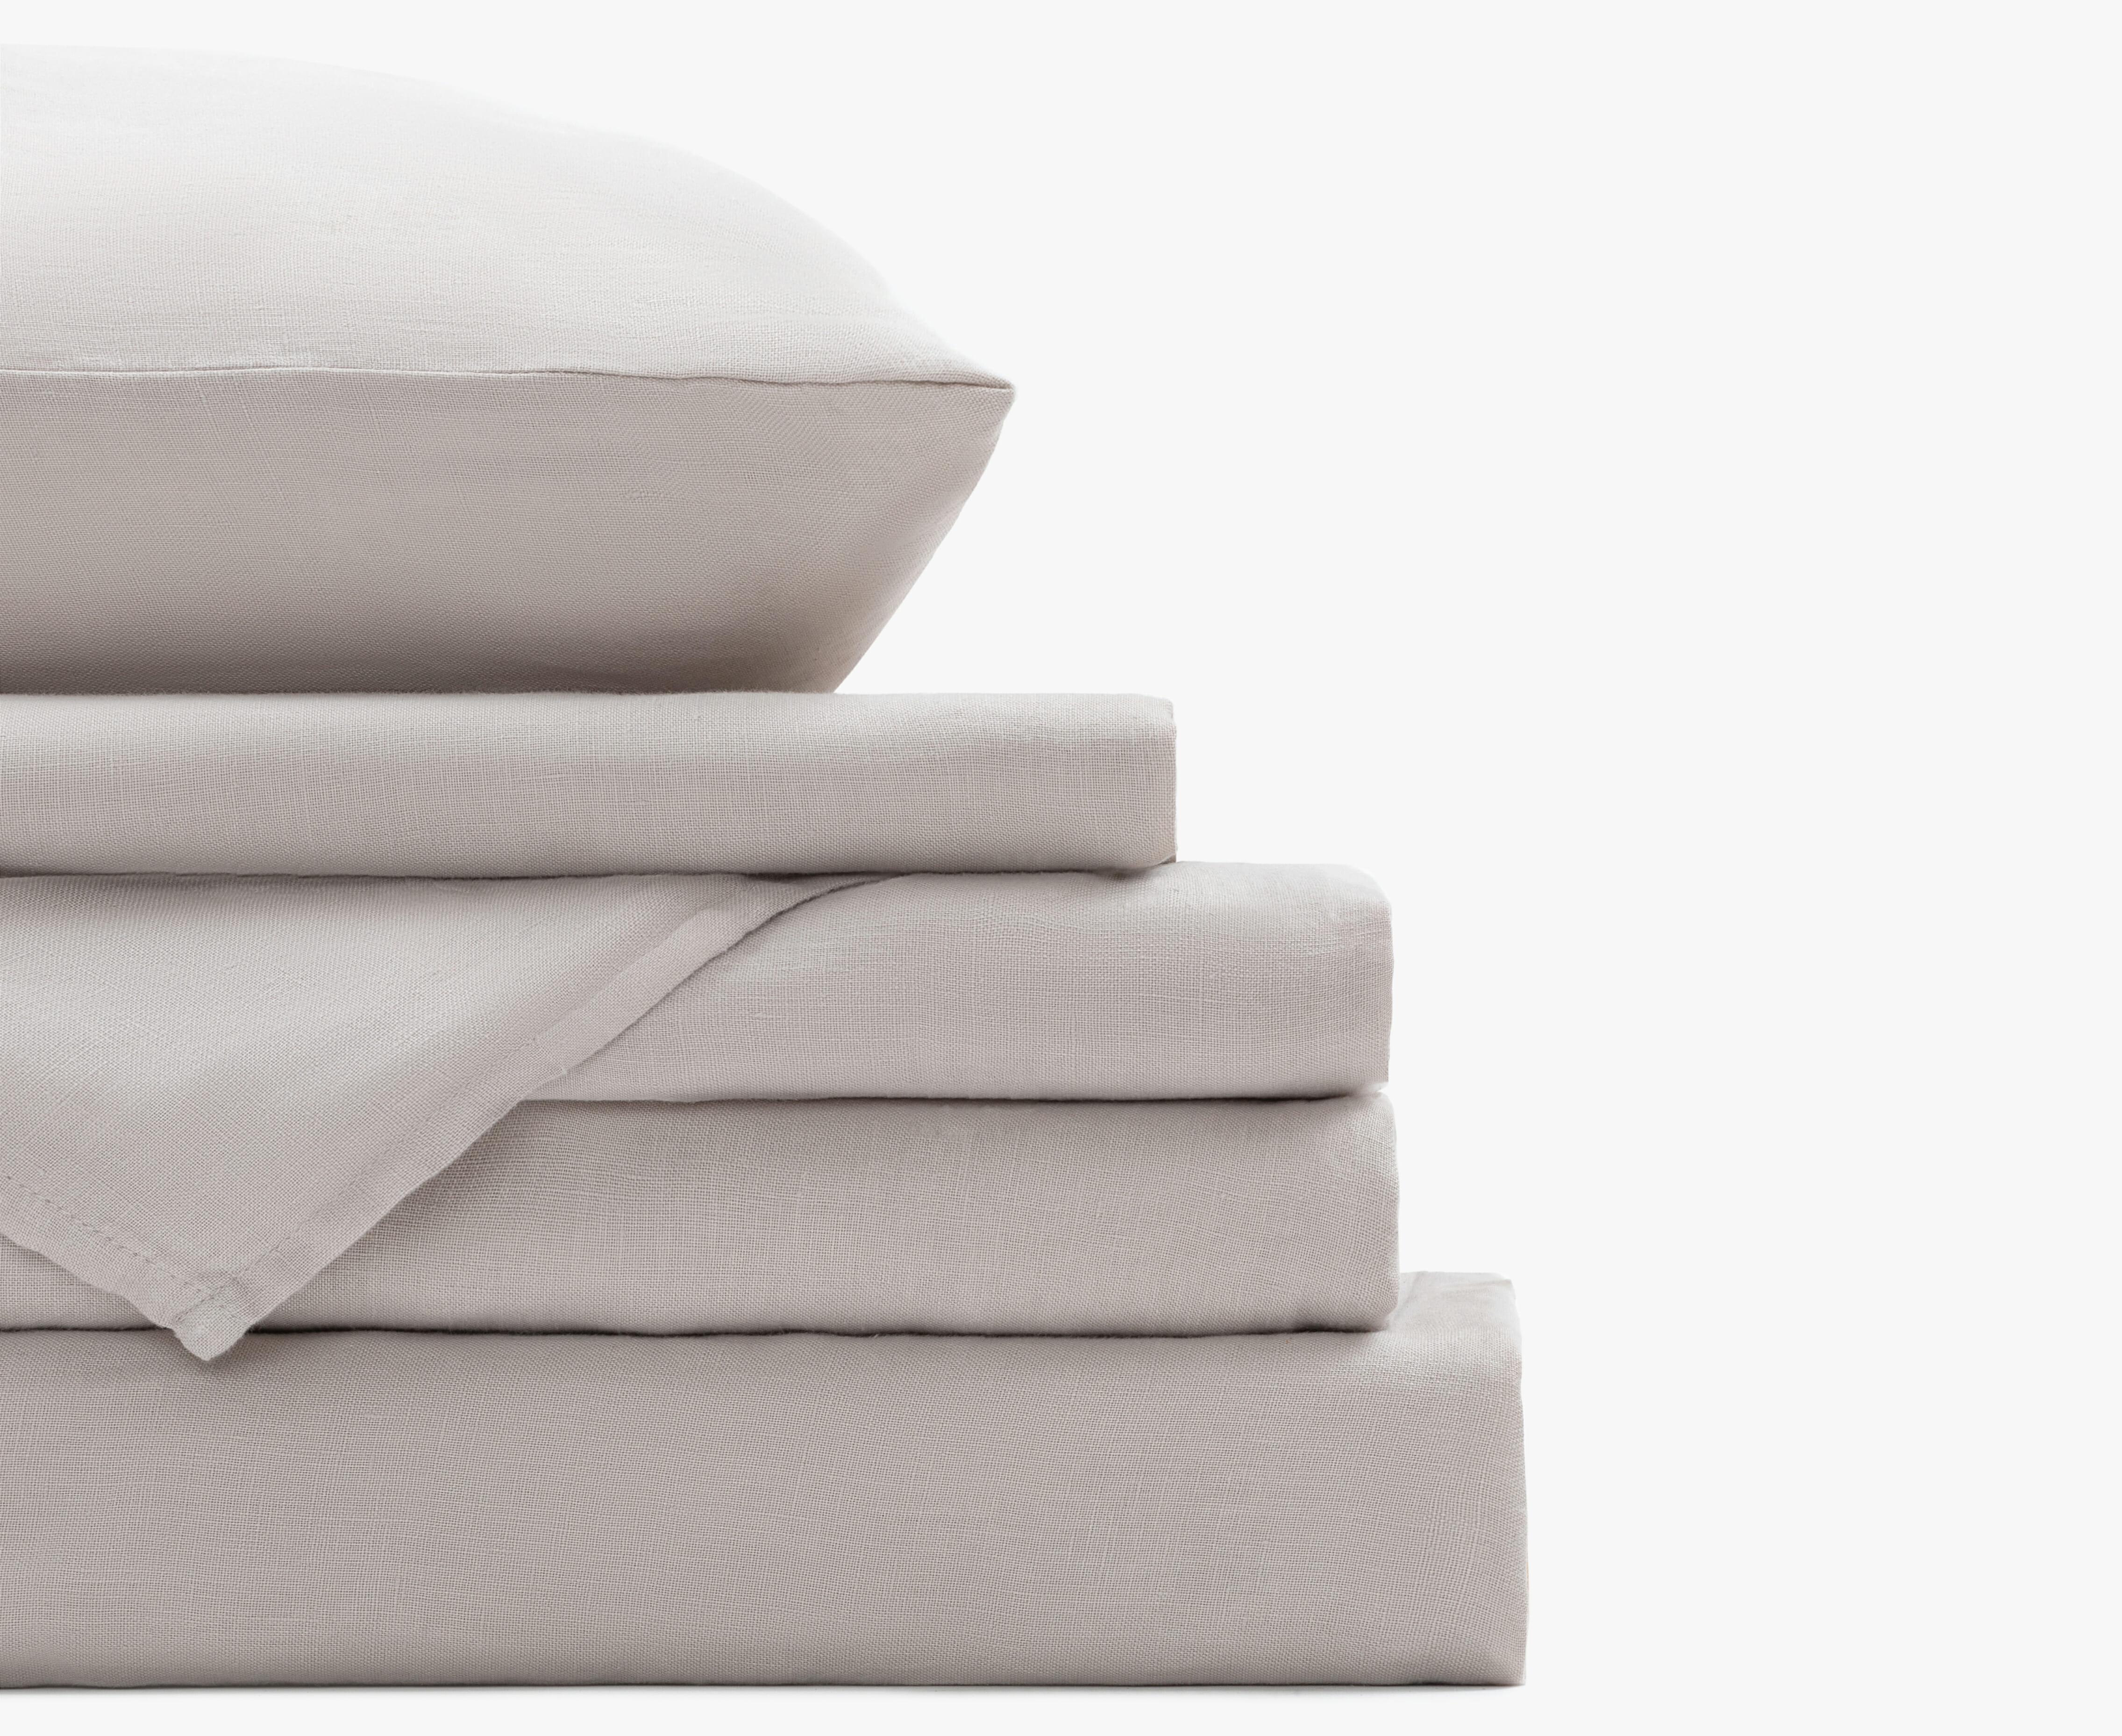 French linen set